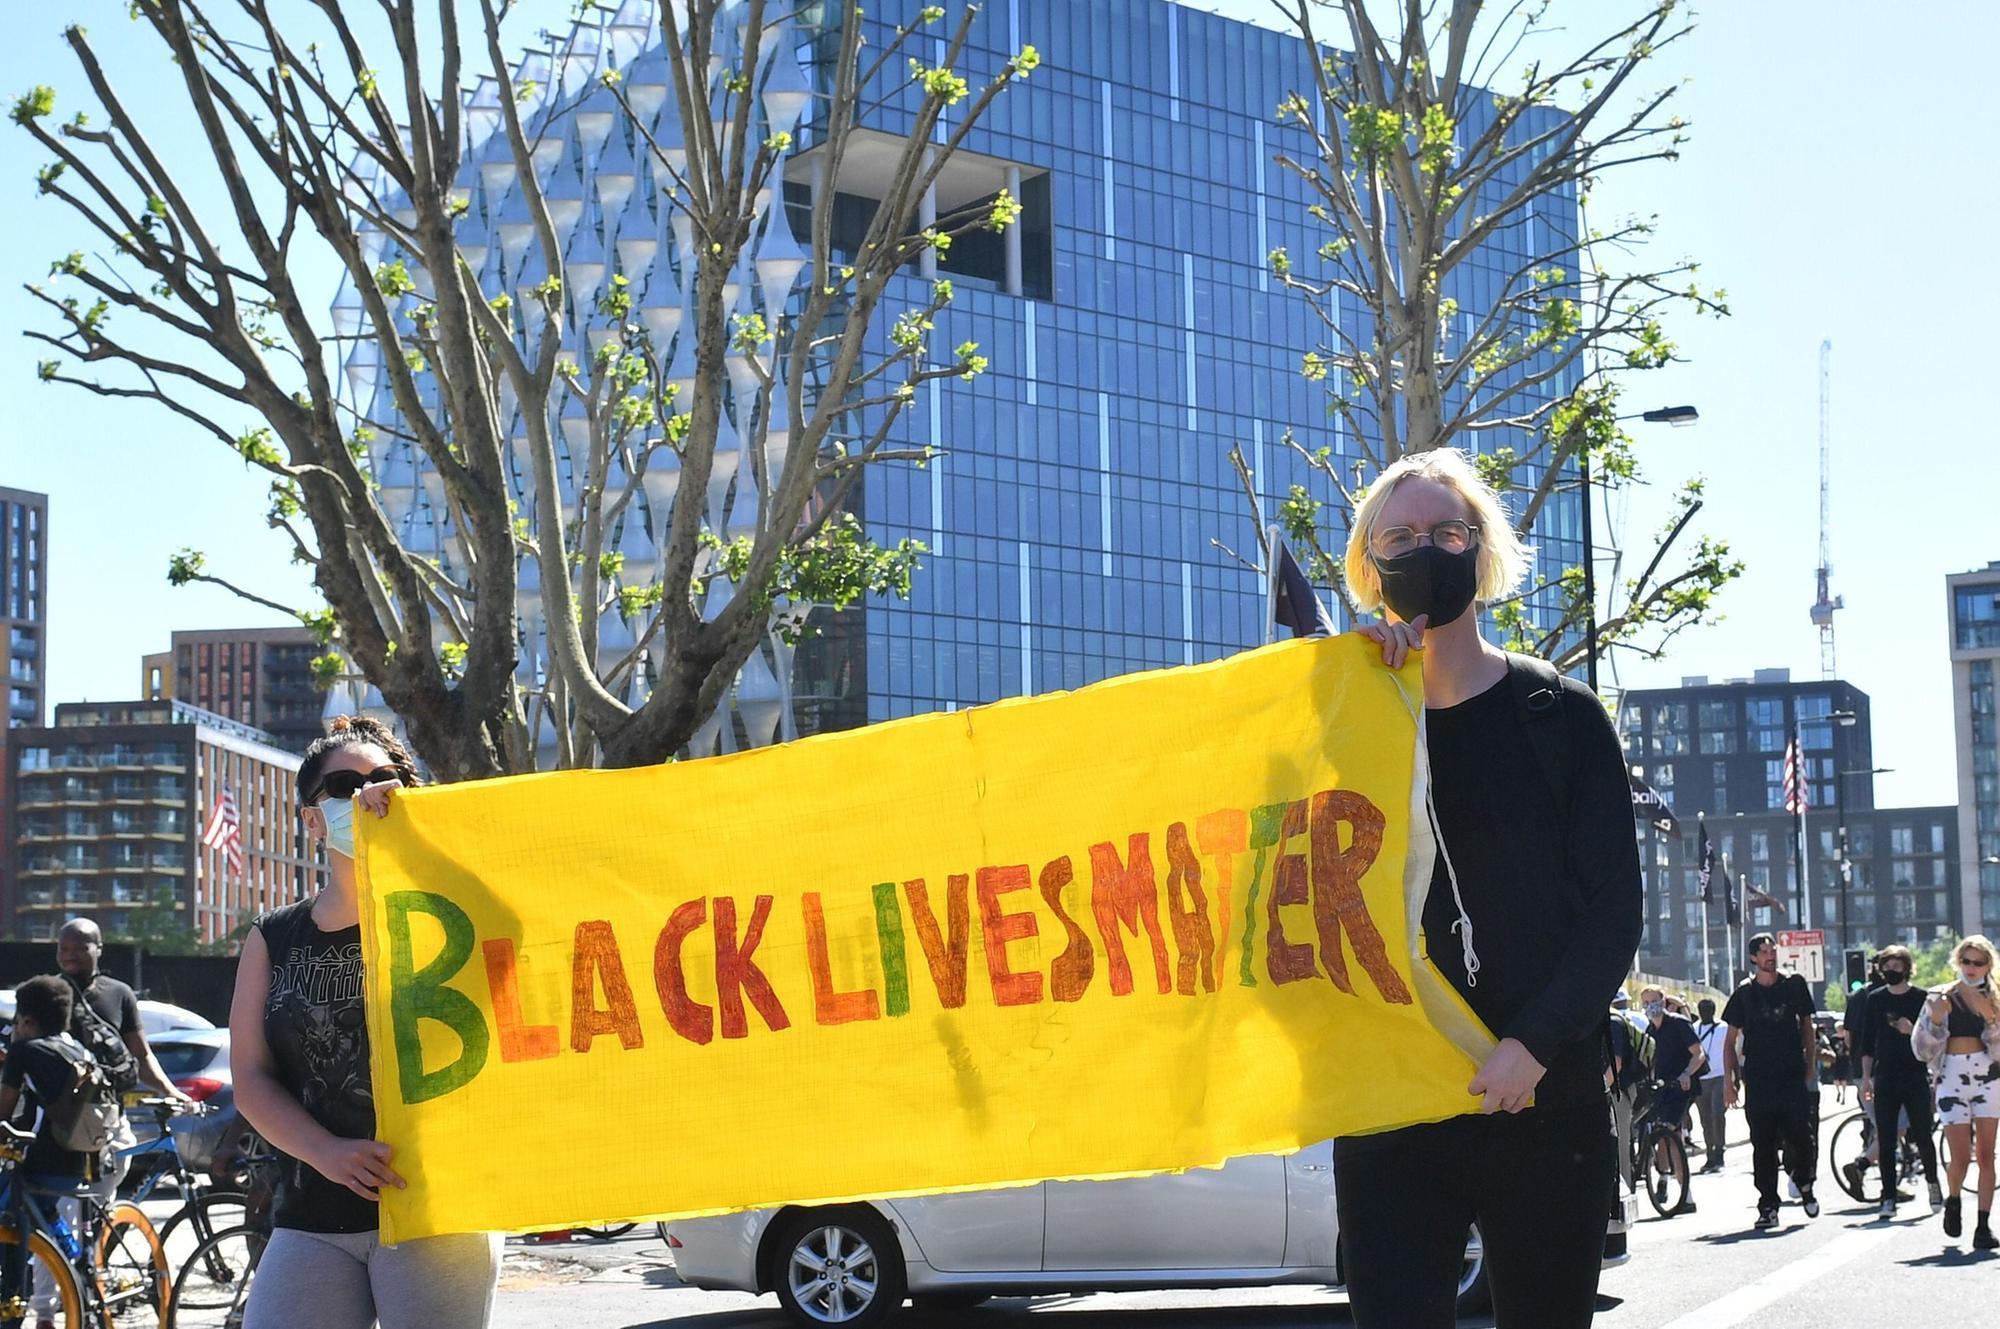 Readers react to Black Lives Matter protest planned for Edinburgh